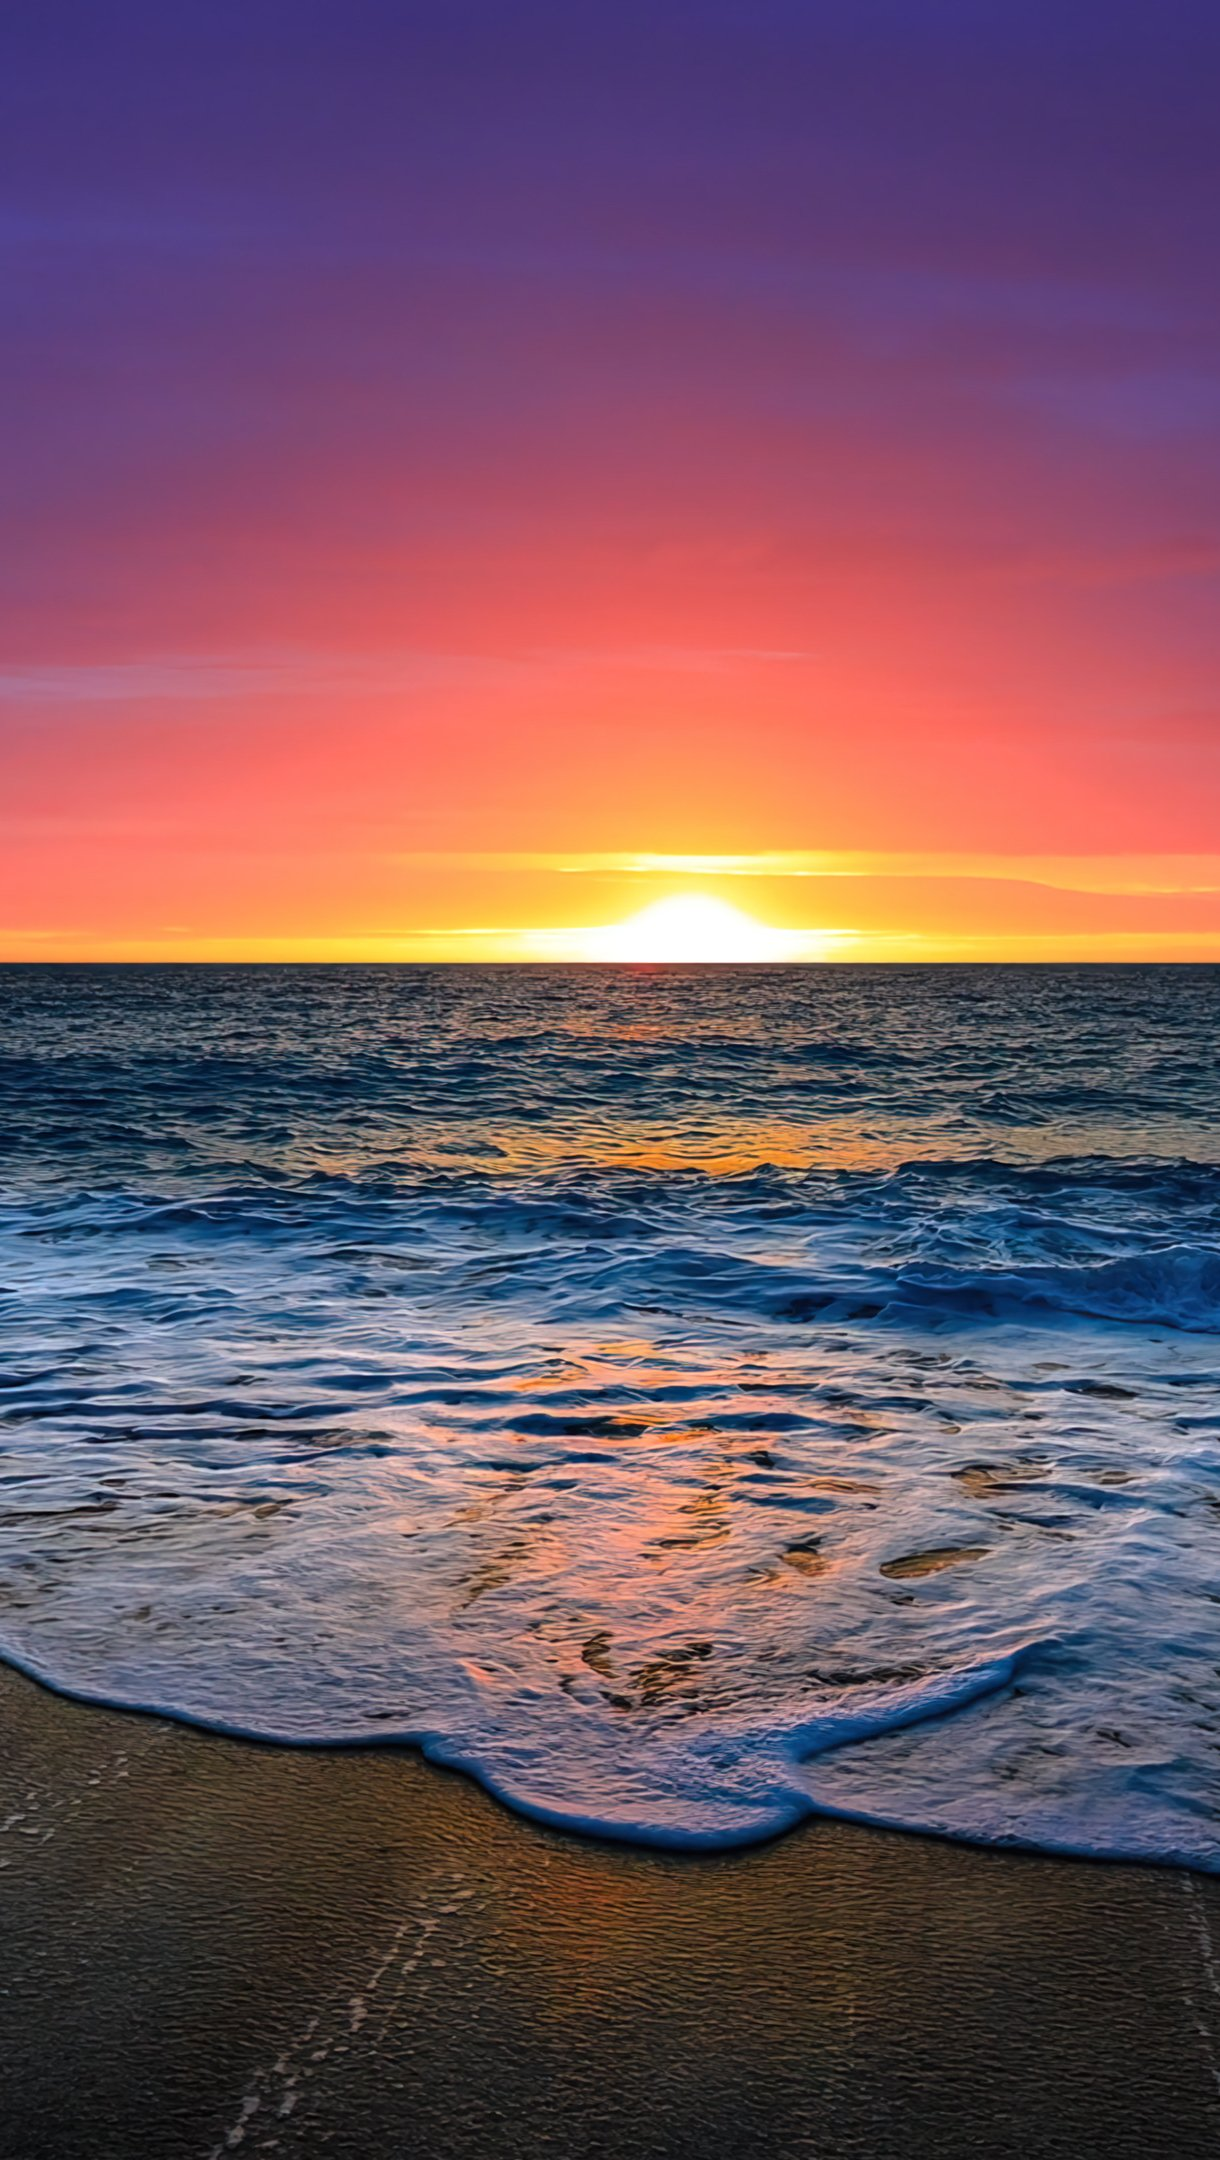 Wallpaper Beautiful sunset at the beach Vertical